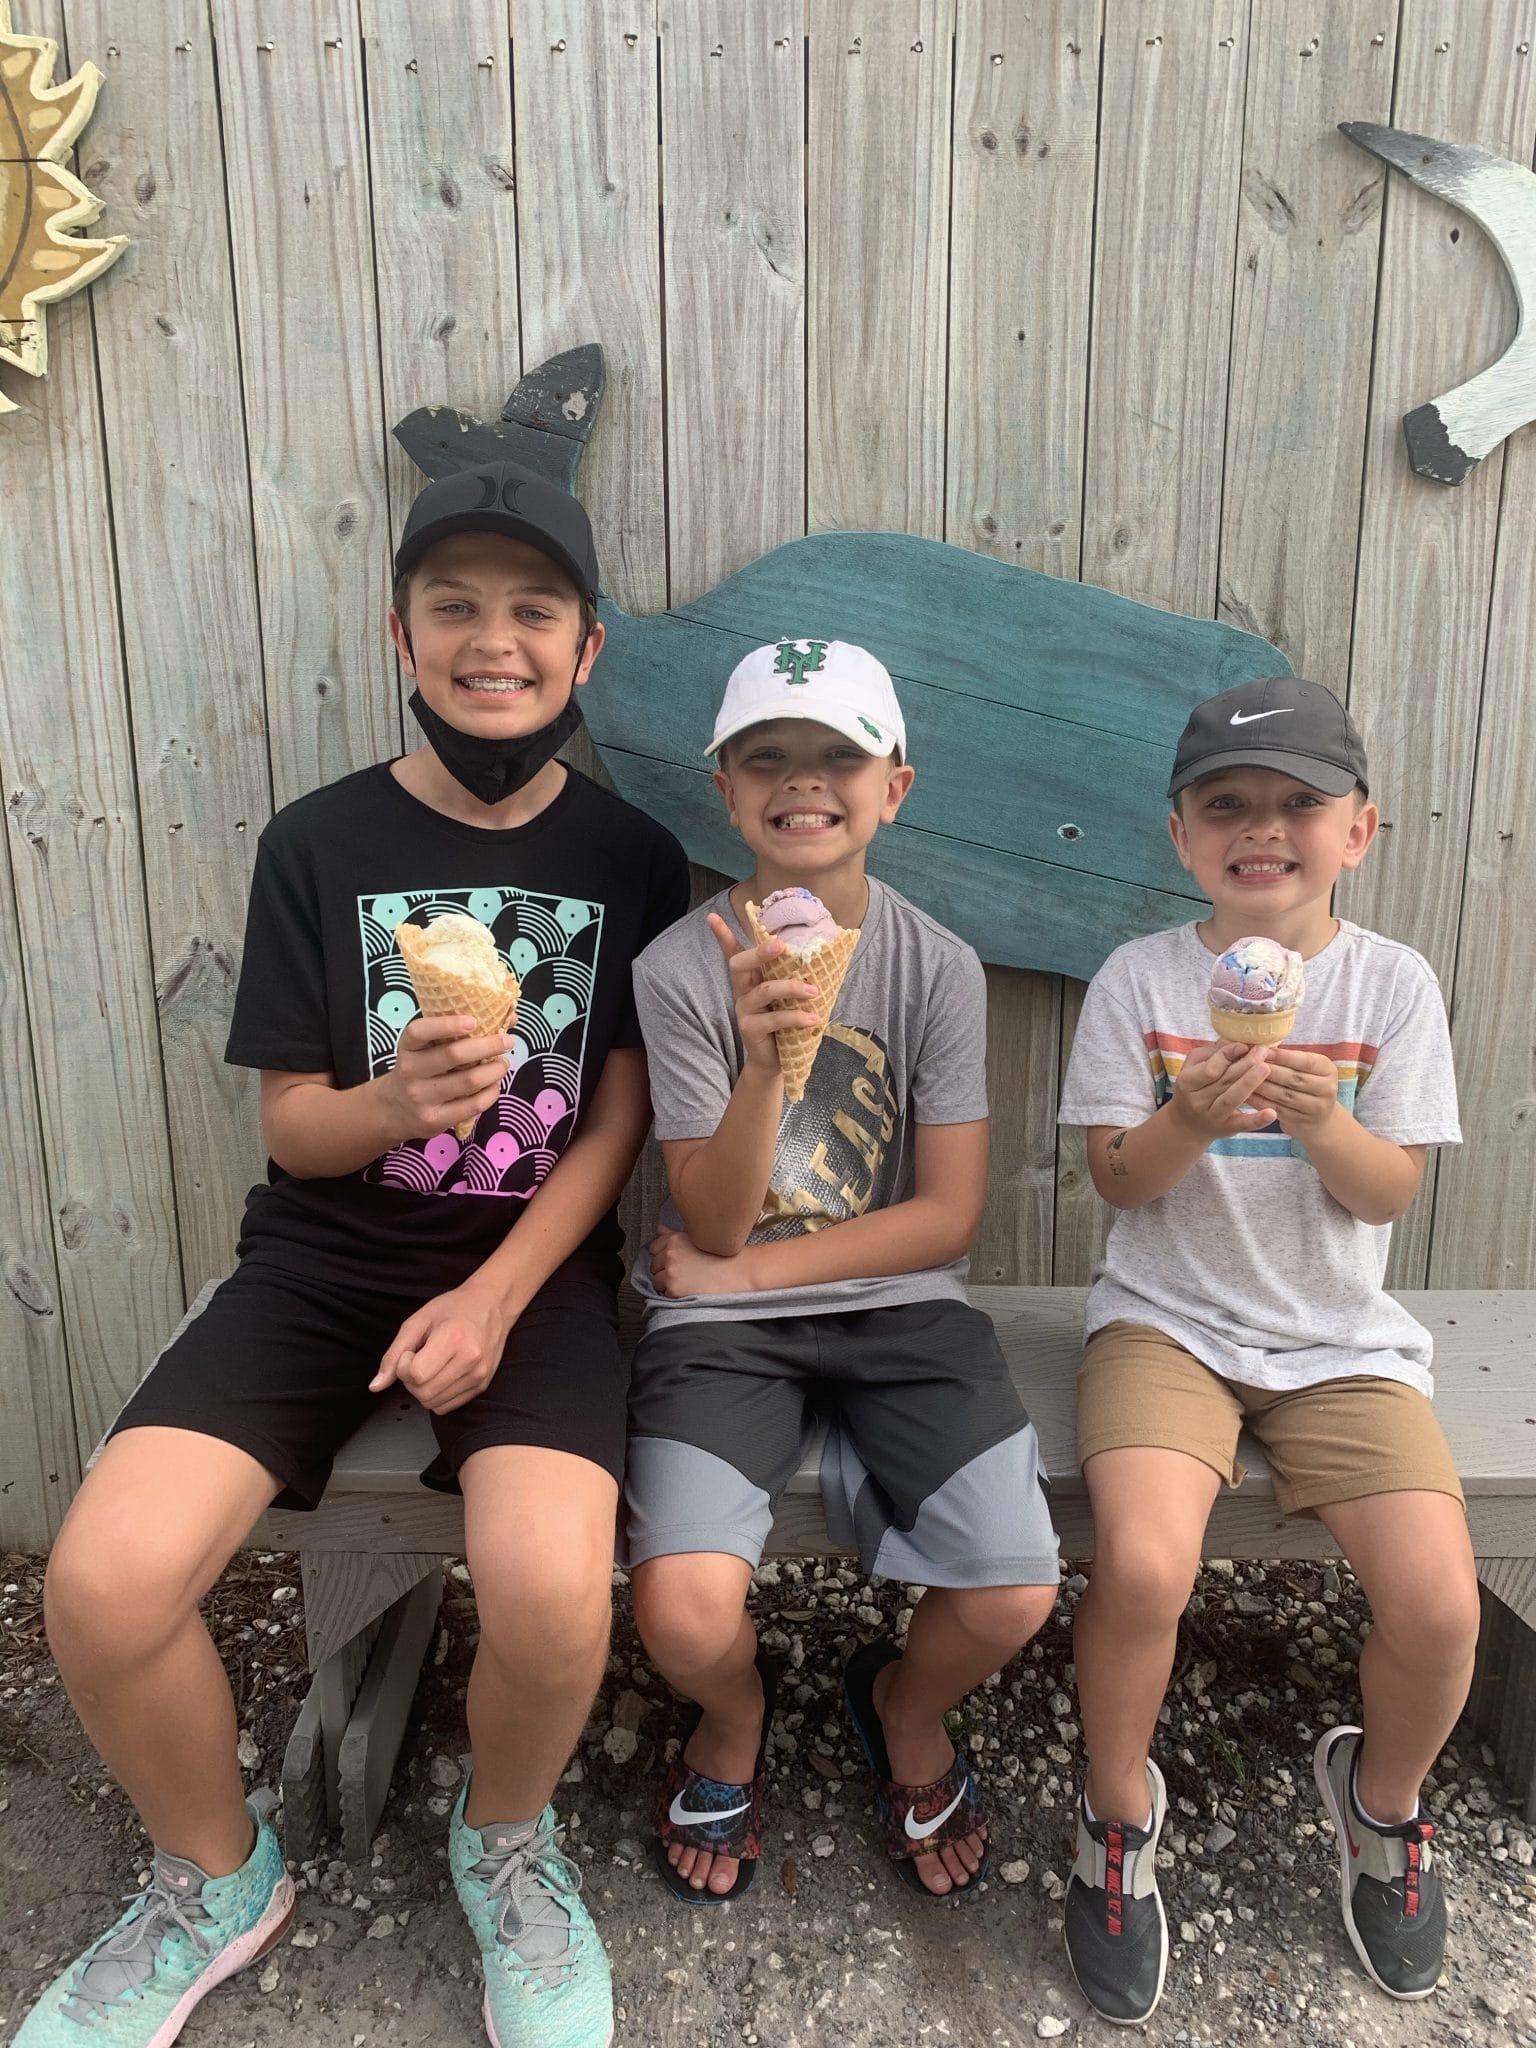 Blue Mountain Beach Creamery, 30A, Destin, Florida vacation 2021, Stilettos and Diapers